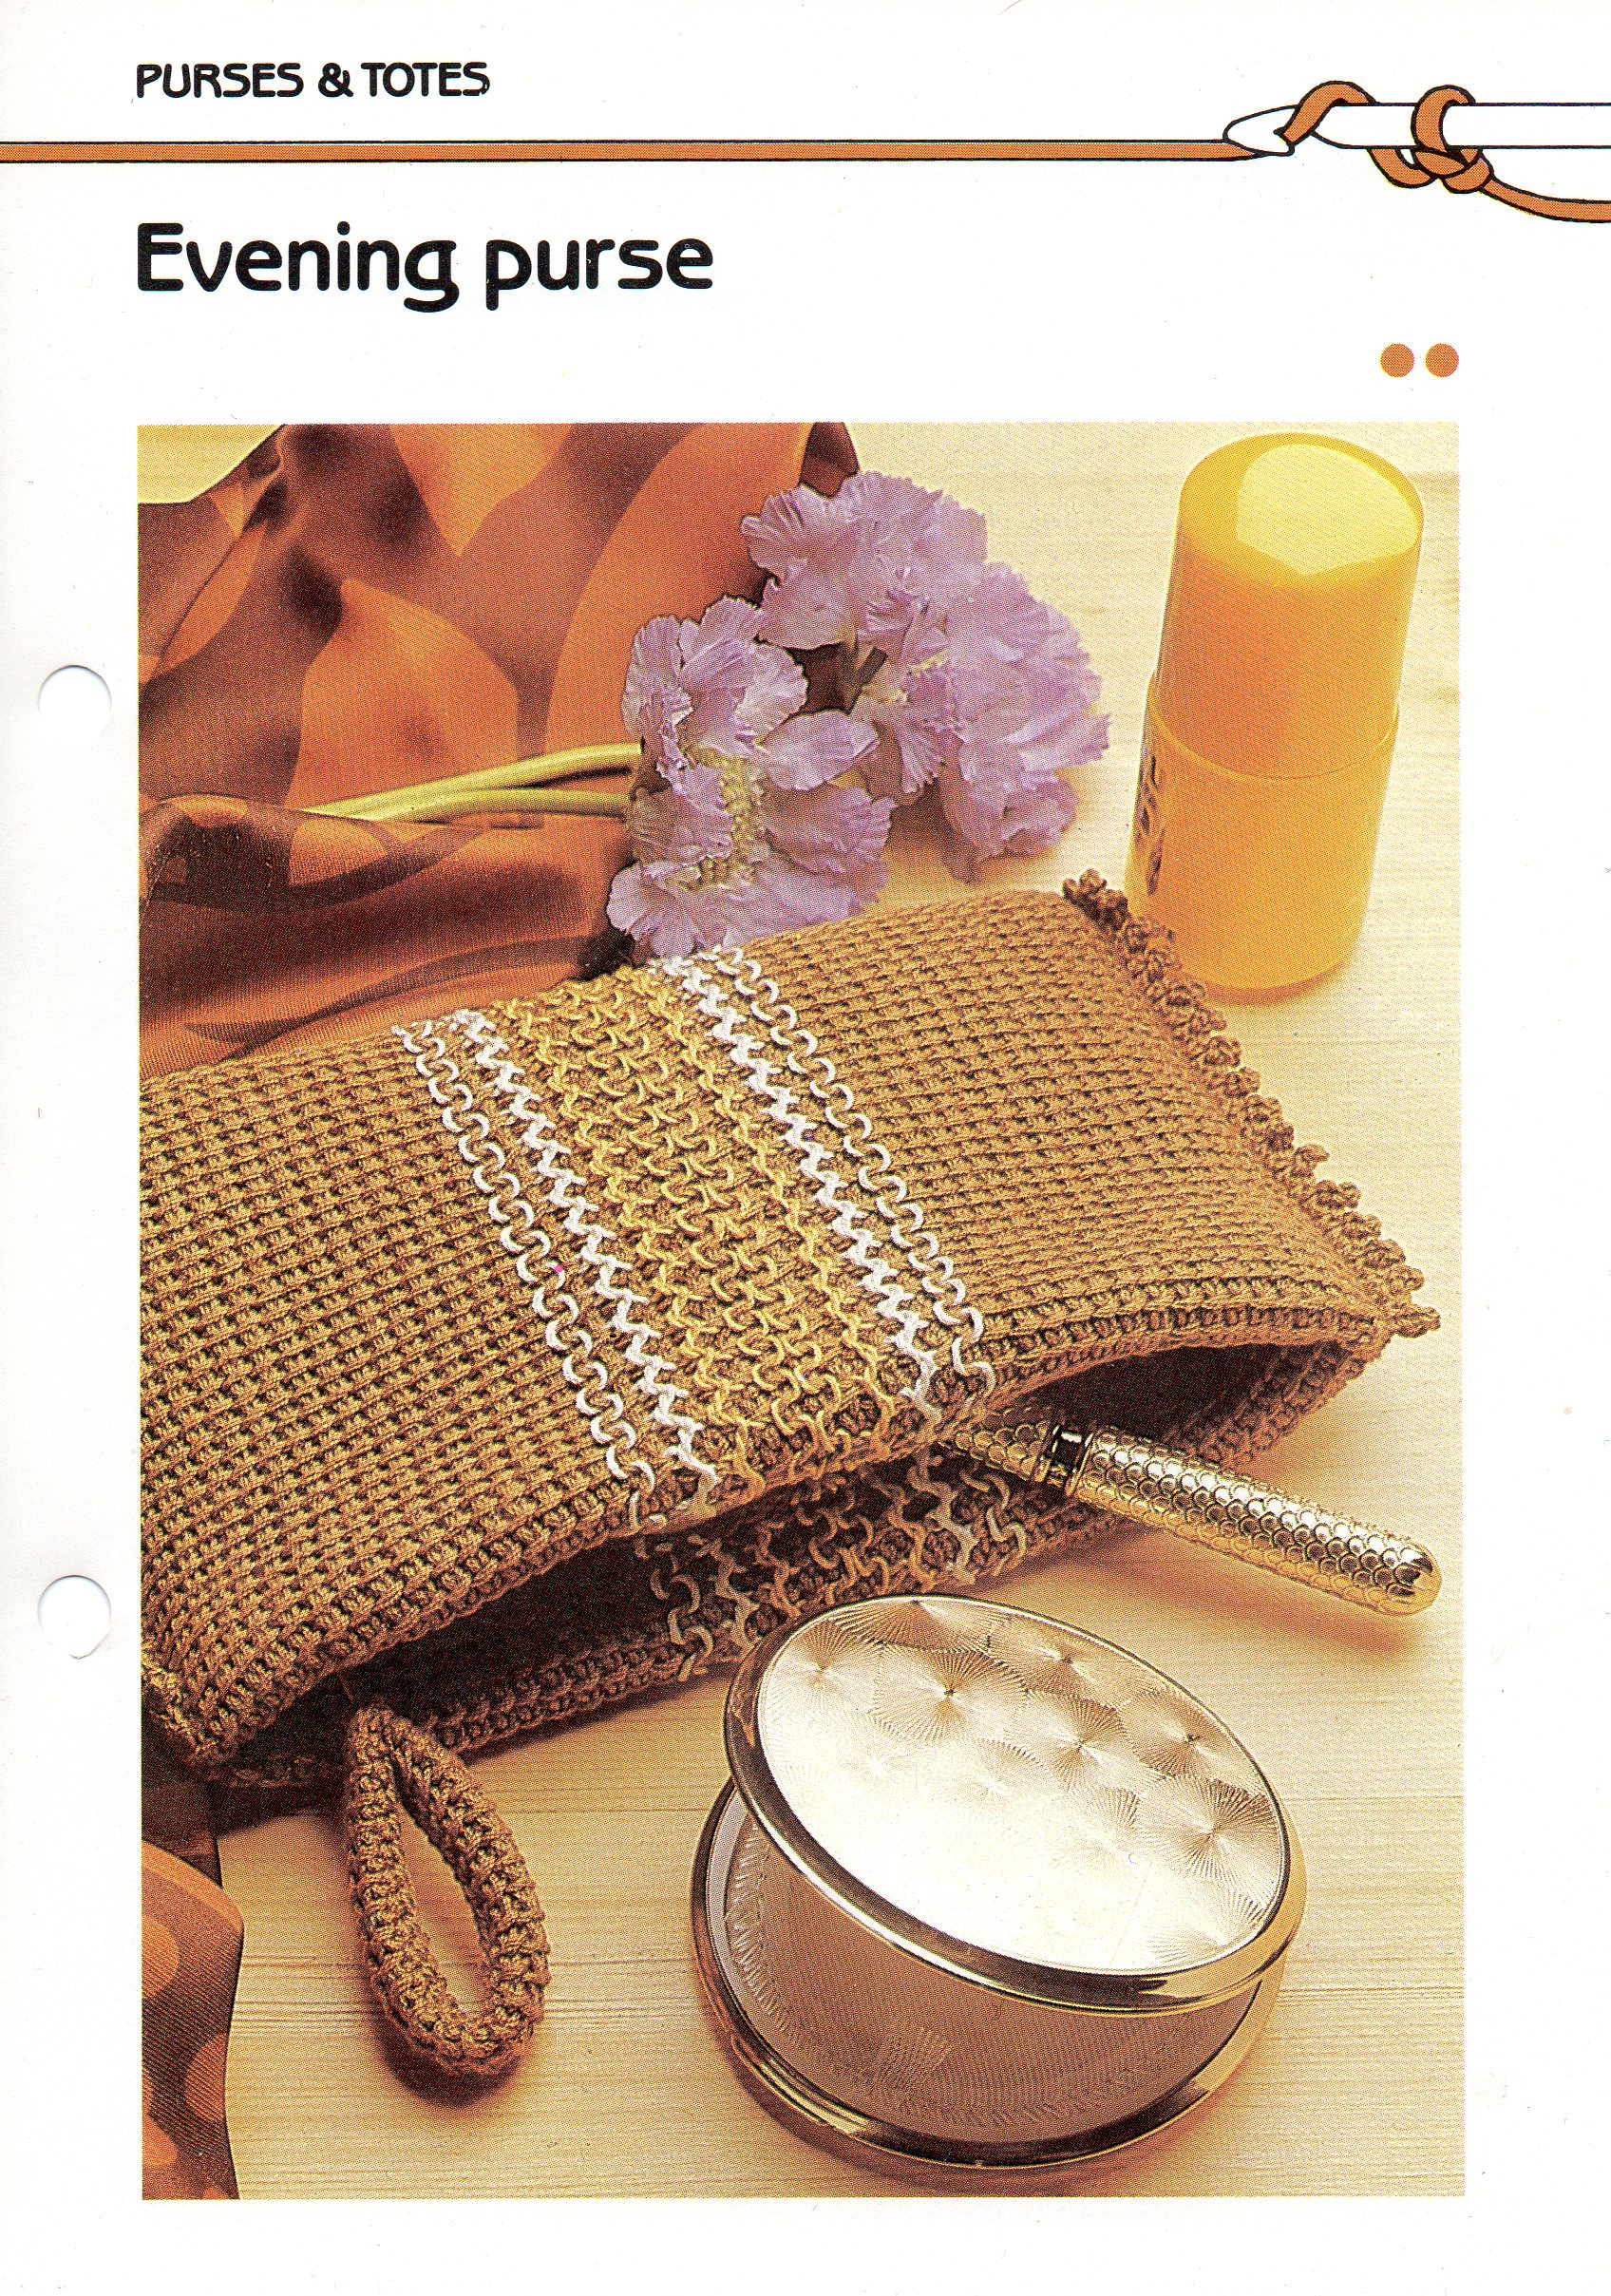 Crochet Evening Purse Pattern : Crochet Evening Purse Pattern Other Files Arts and Crafts